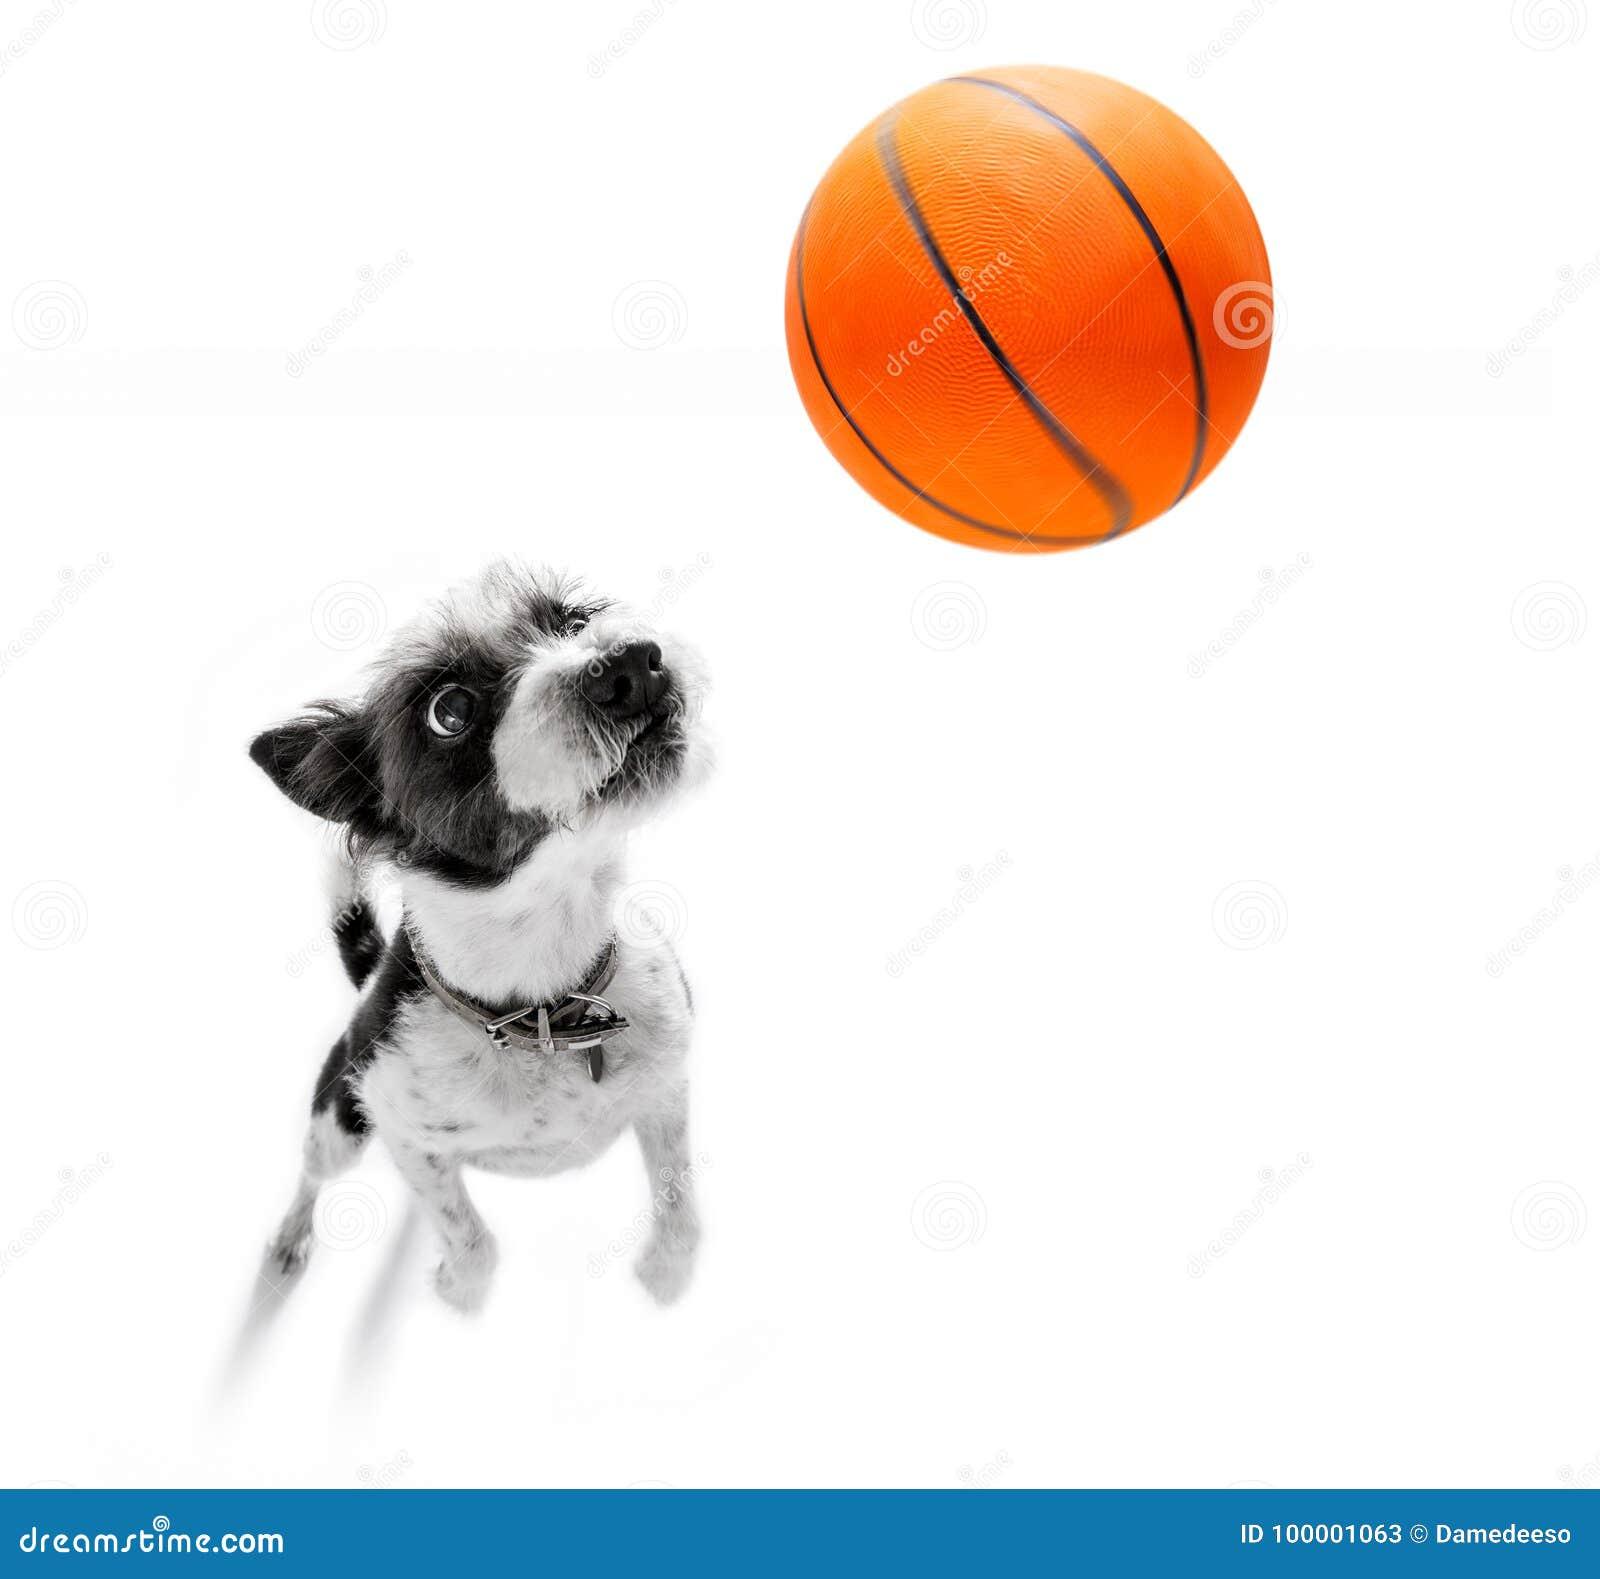 Basketball poodle dog